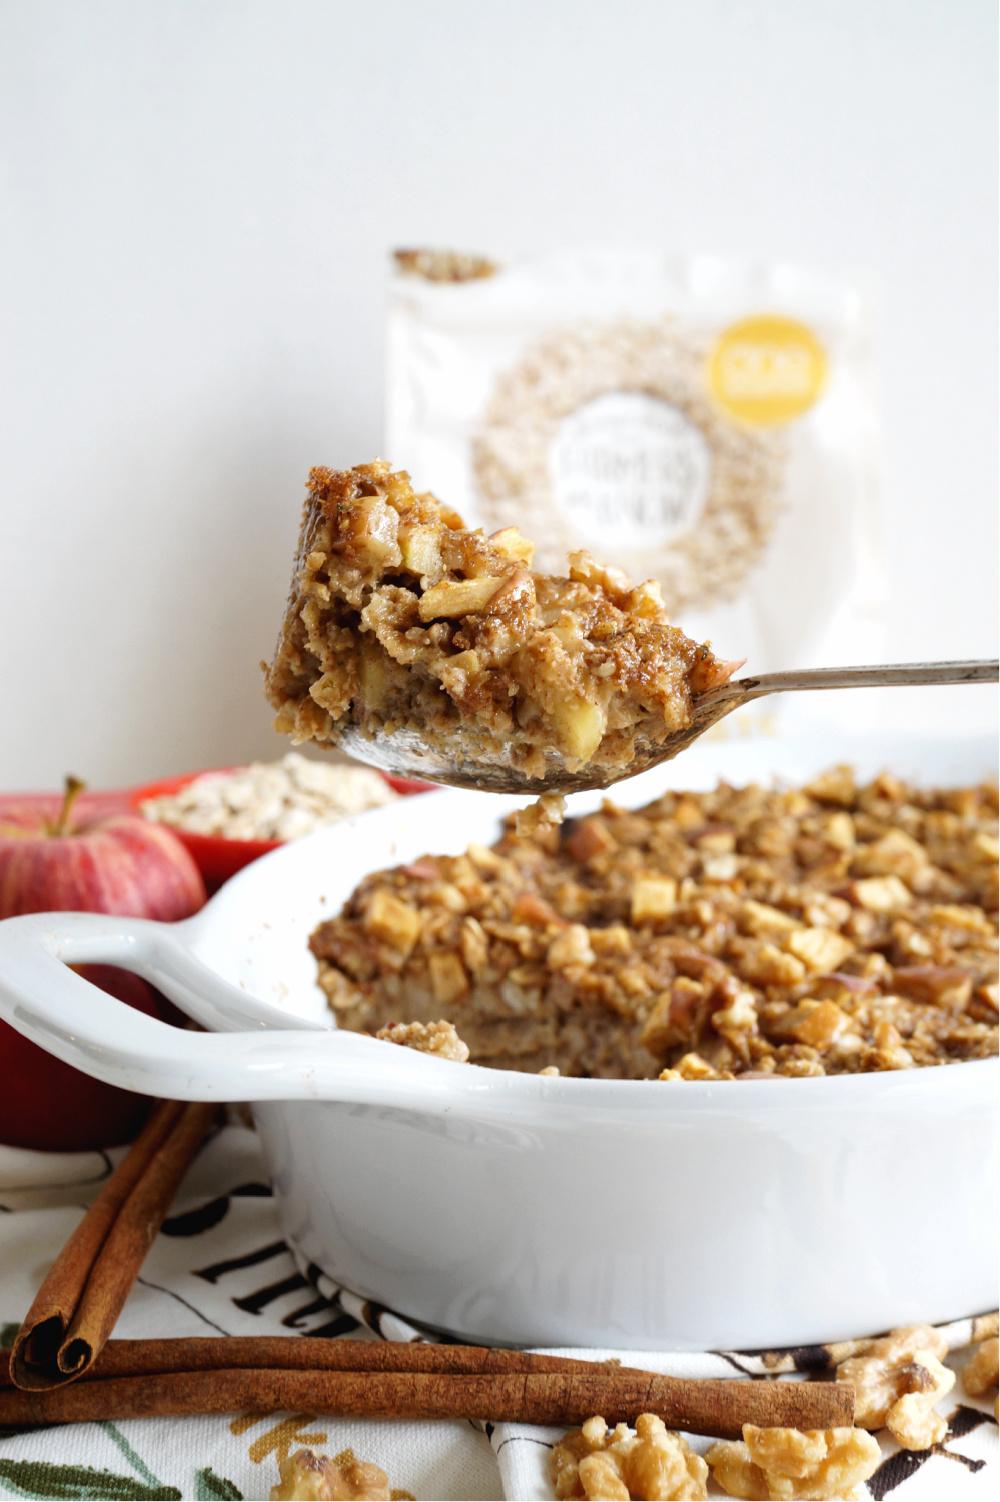 spoonful of apple oatmeal